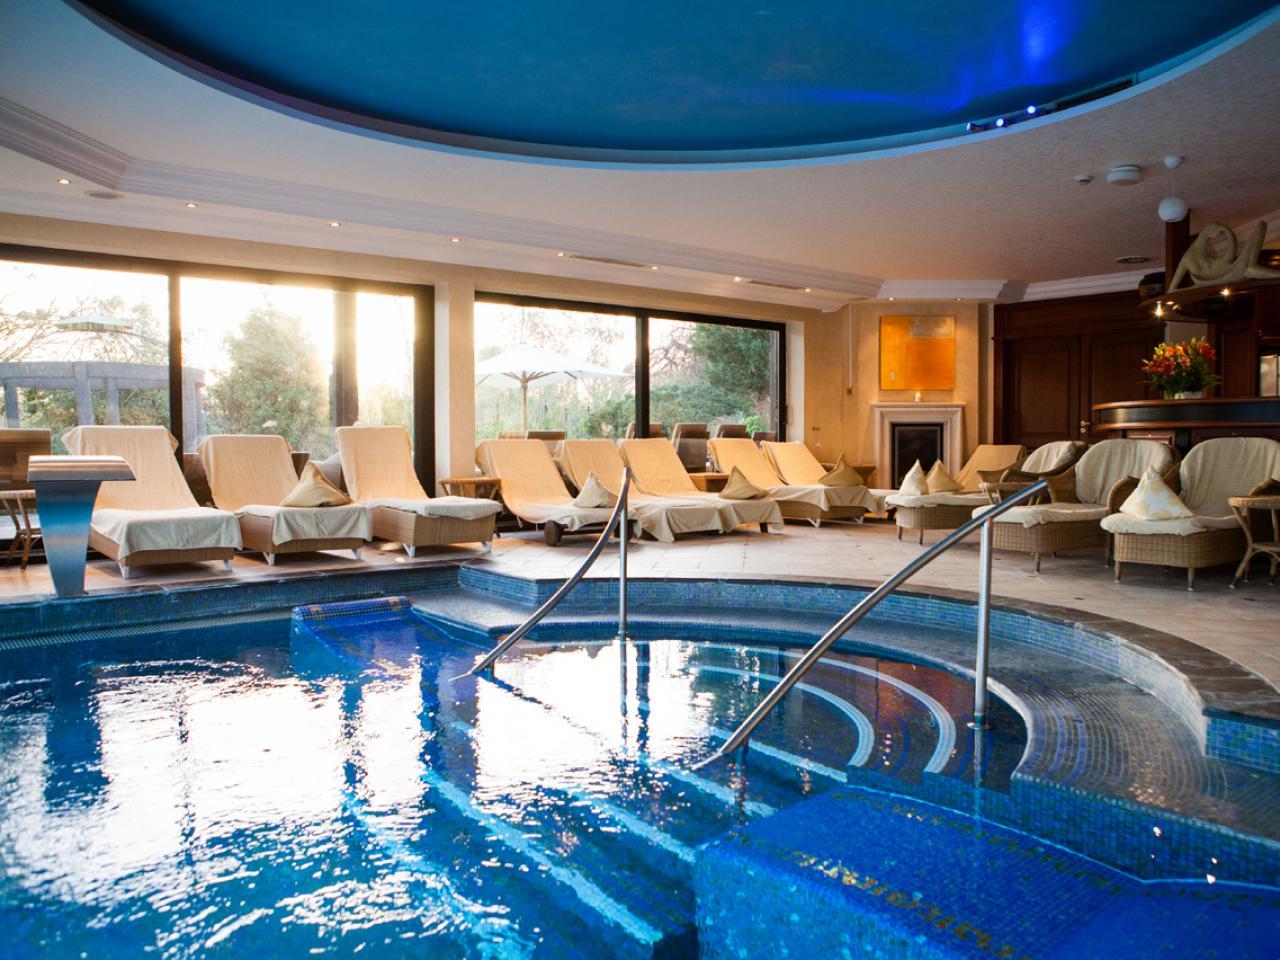 Images of our Luxury Spa  Fredricks Hotel Restaurant Spa Maidenhead